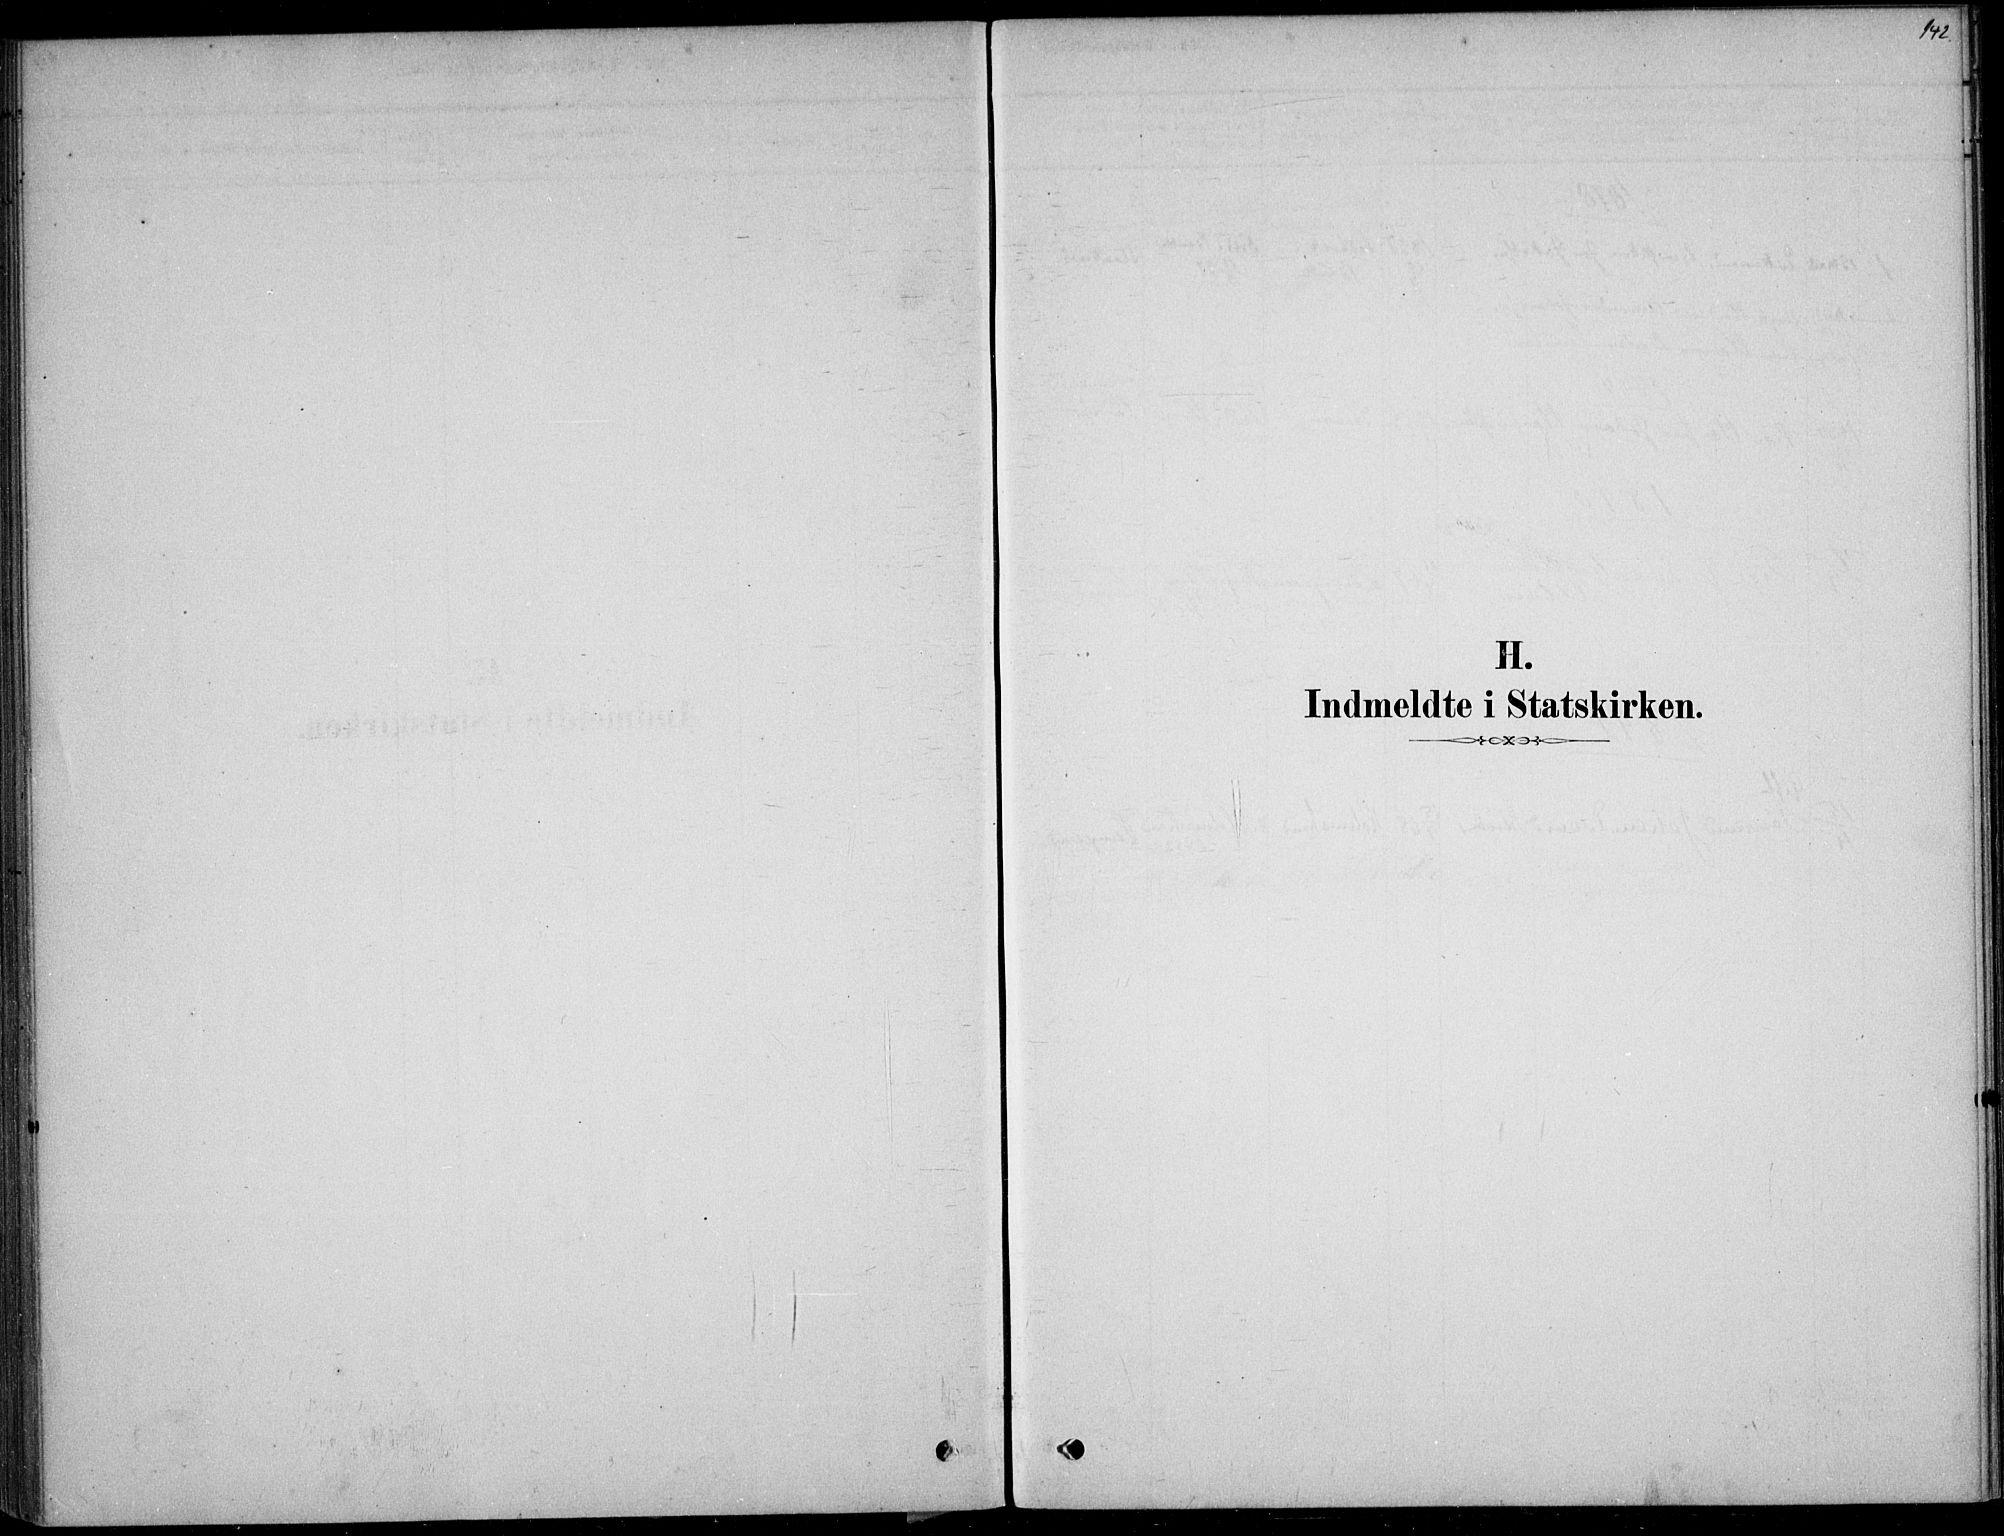 SAKO, Langesund kirkebøker, F/Fa/L0002: Ministerialbok nr. 2, 1878-1892, s. 142